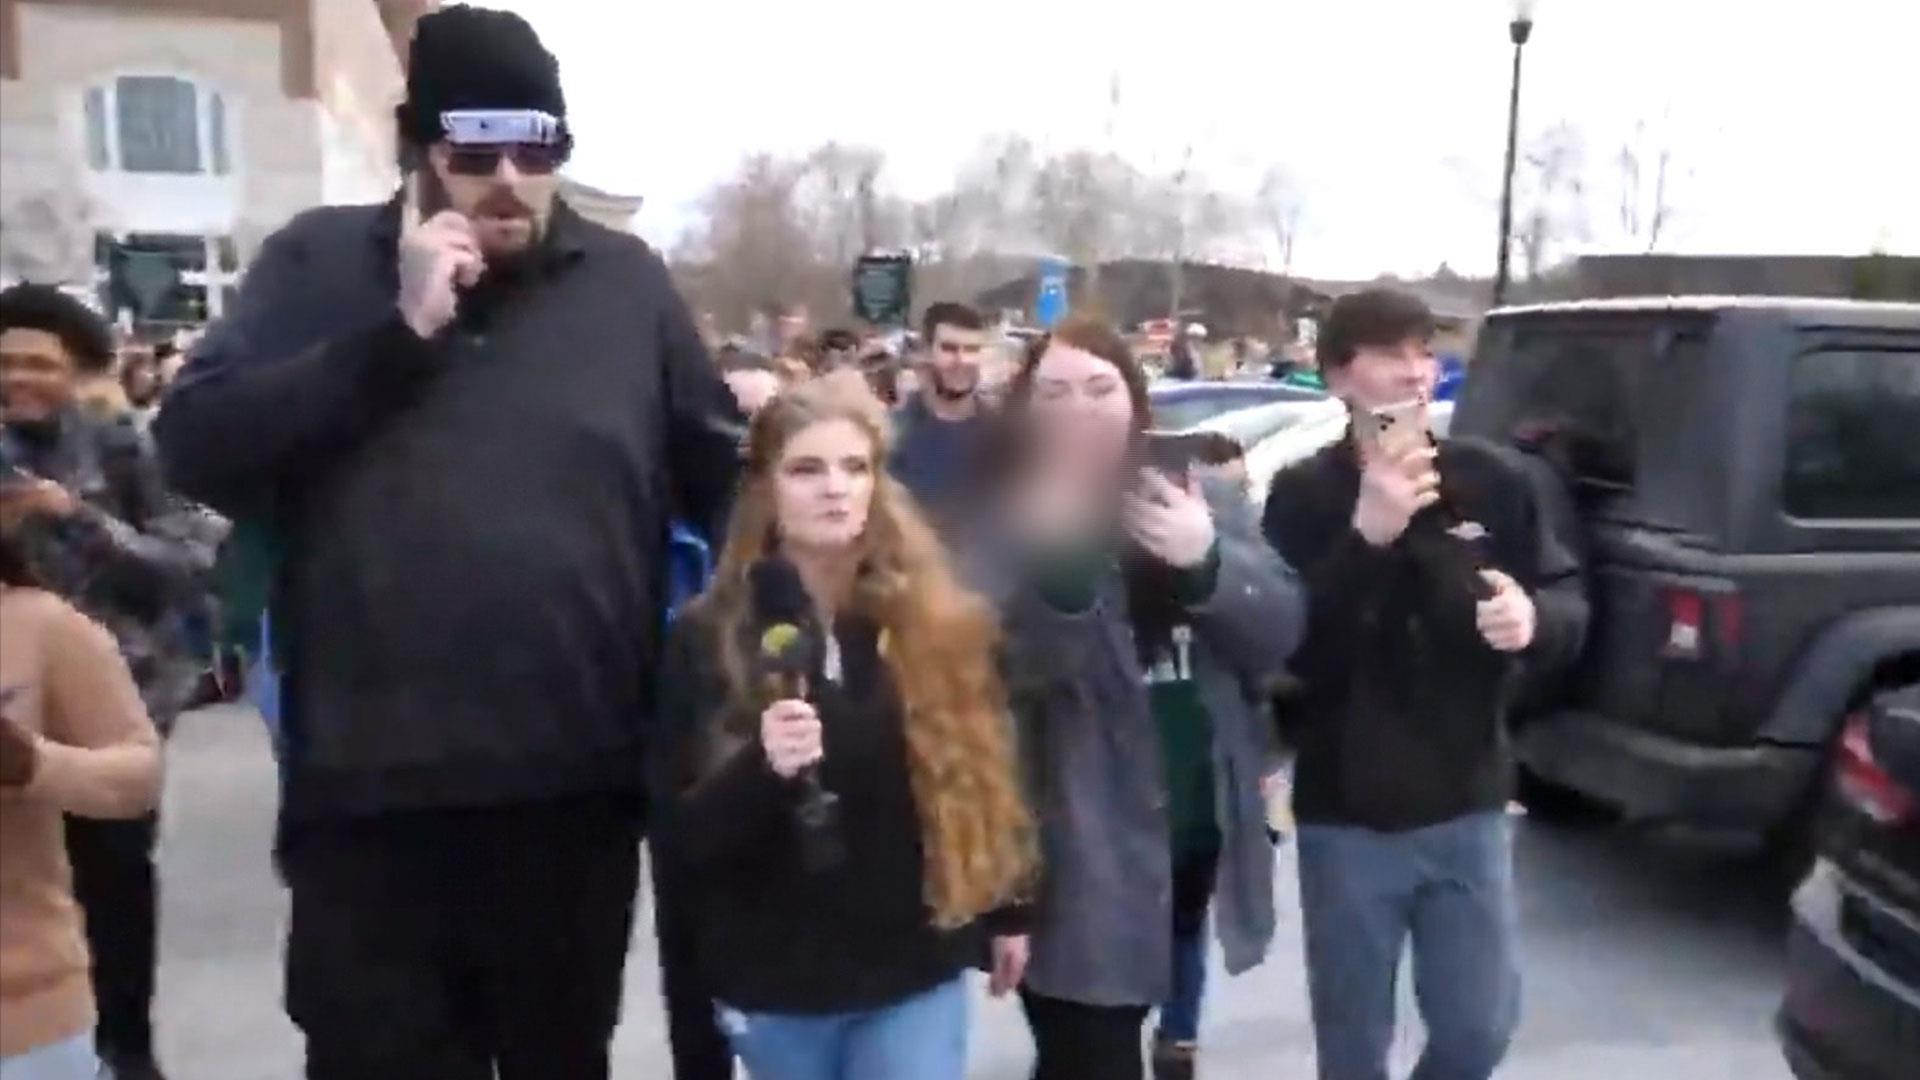 'Gun Girl' Kaitlin Bennett's appearance on Ohio University campus sparks protests